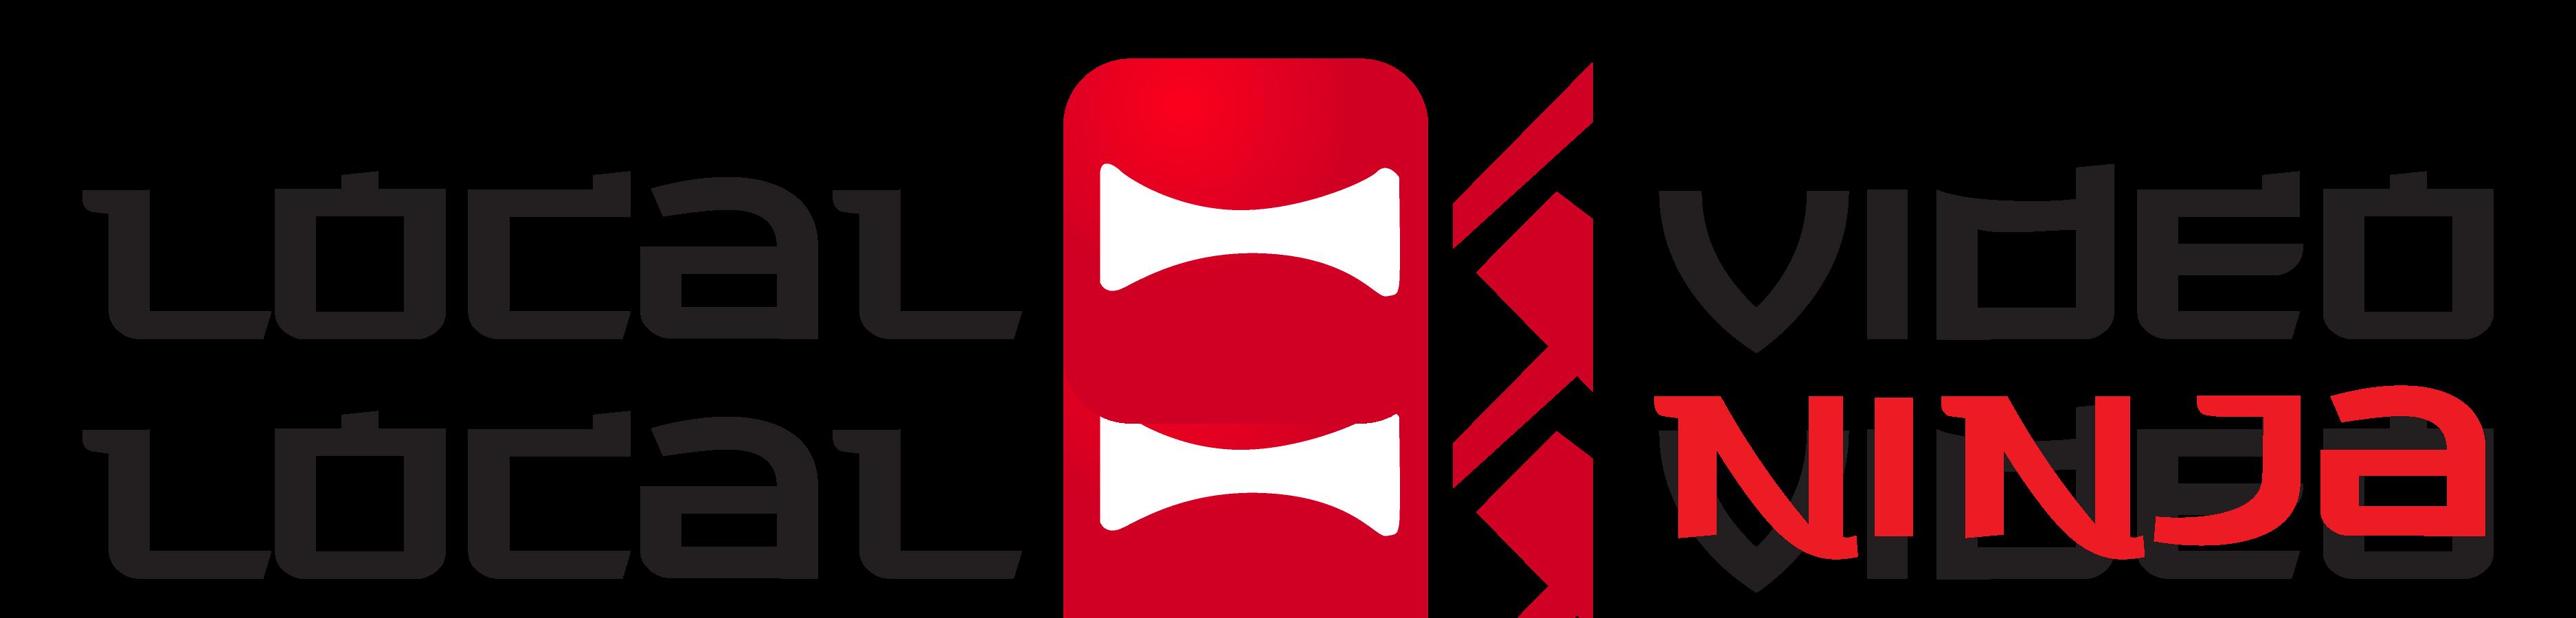 Local-Video-Ninja-Logo-Full-Size